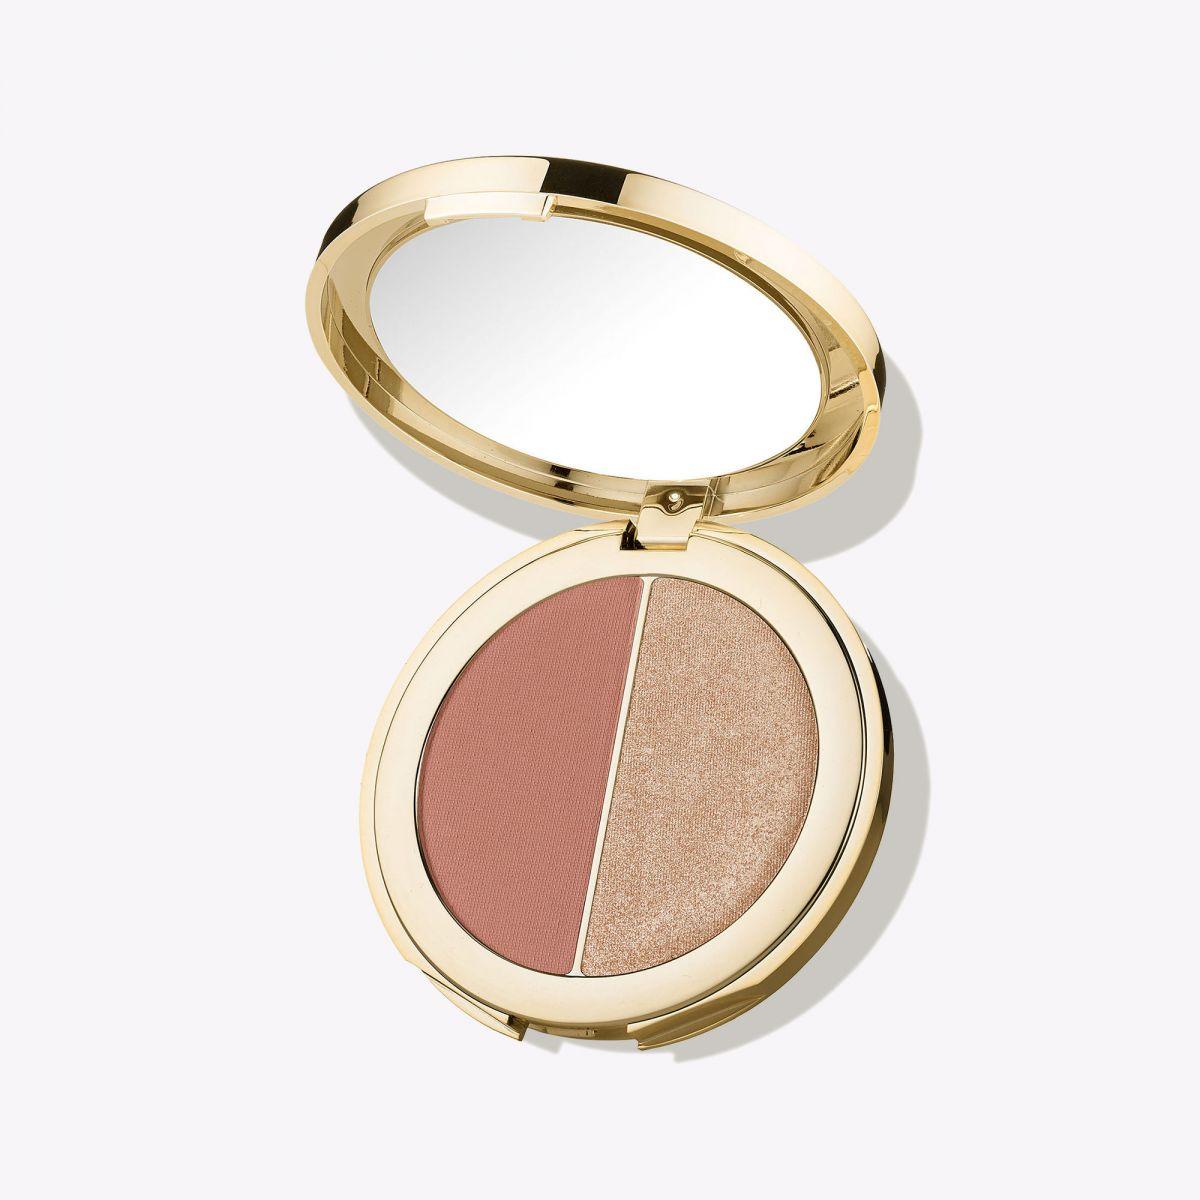 Палетка хайлайтера и румян Tarte Cosmetics - limited-edition blush & glow blush & highlighter